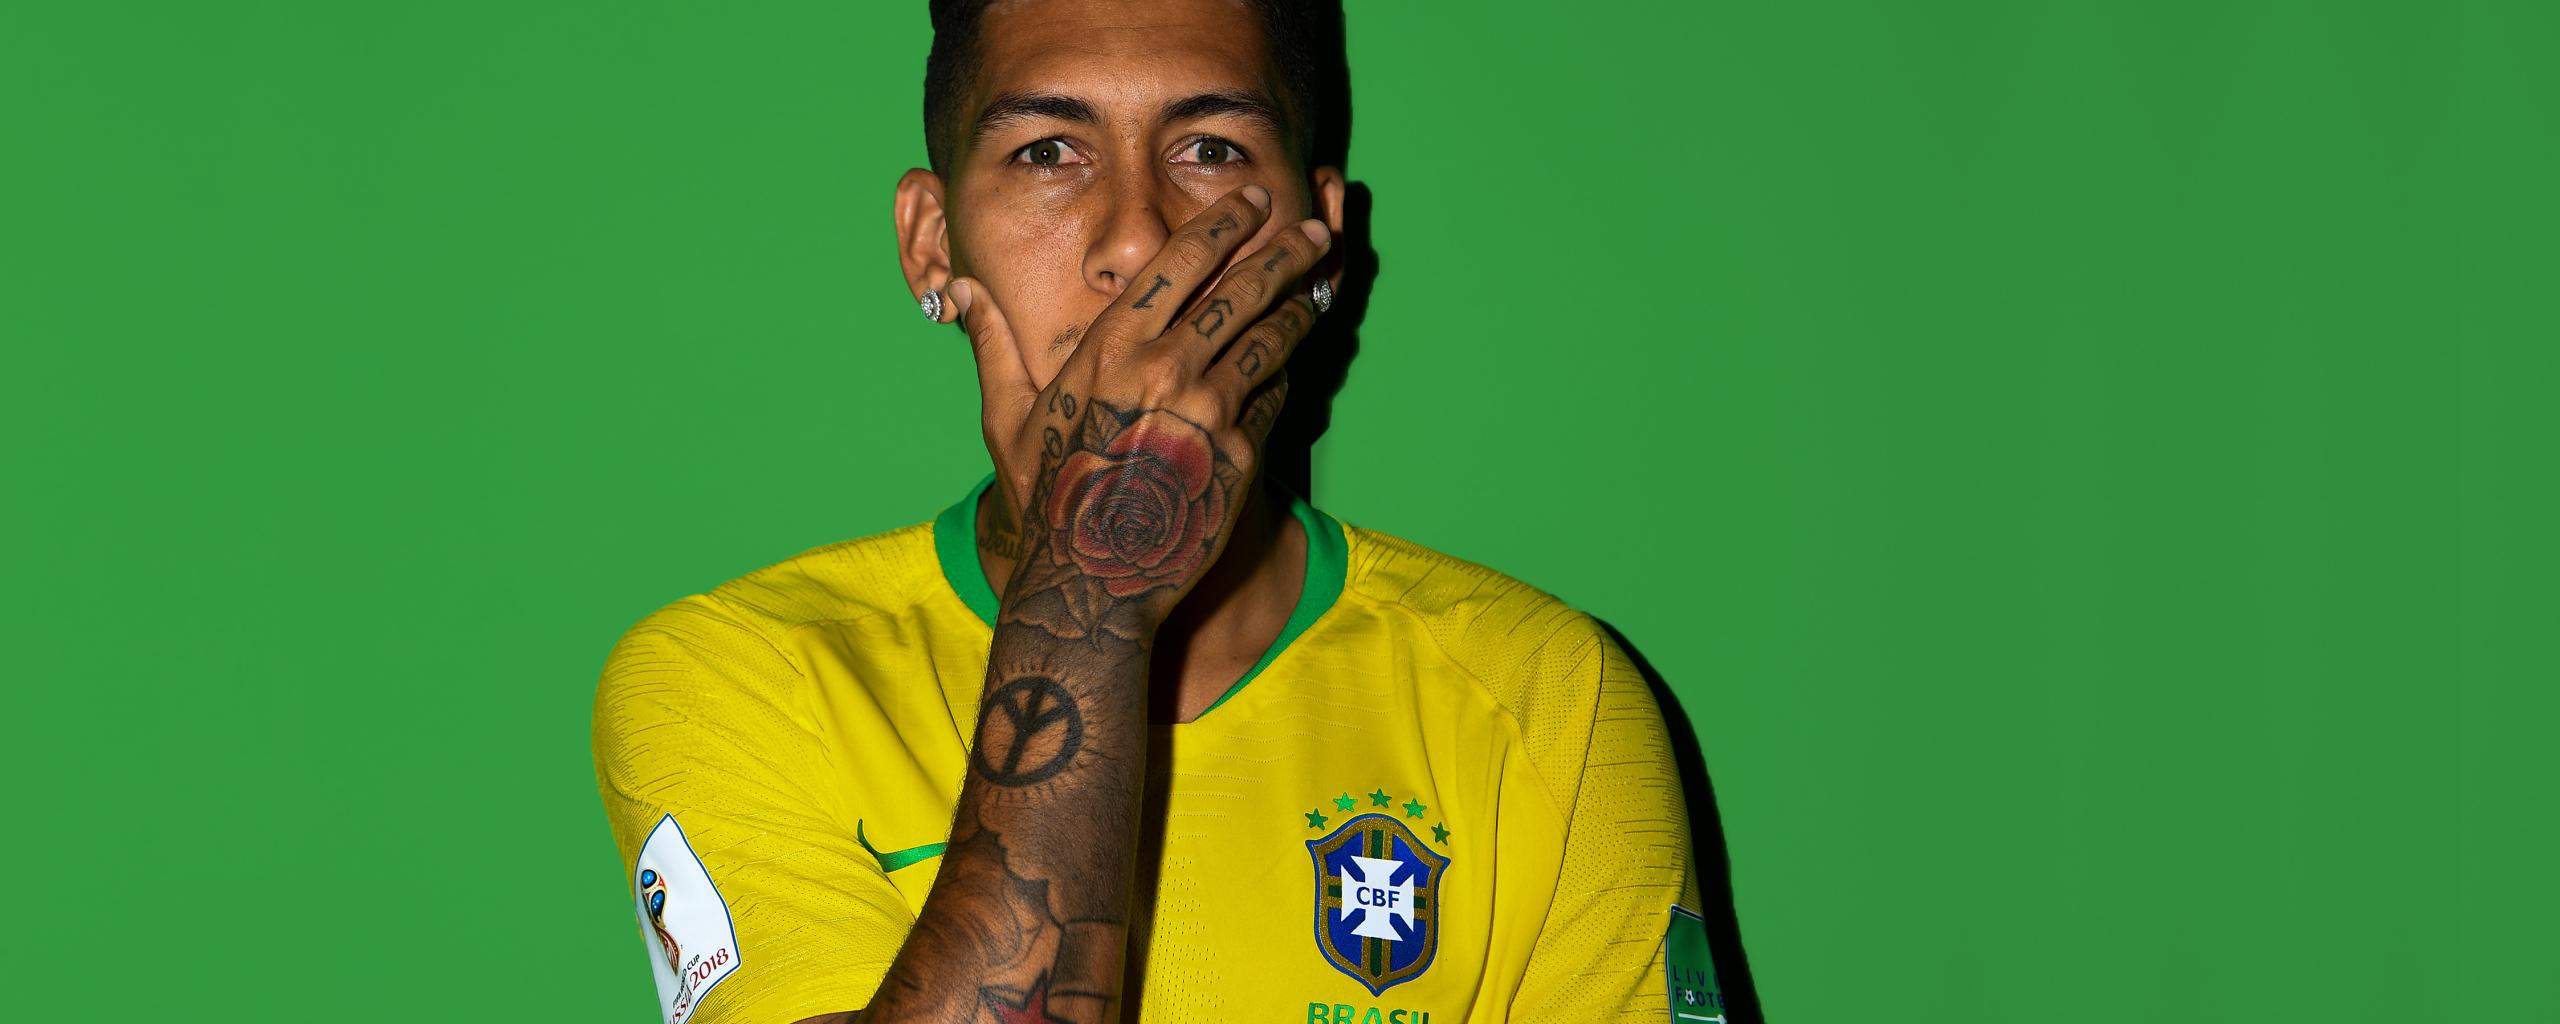 Download Roberto Firmino Fifa 2018 5120x2880 Resolution